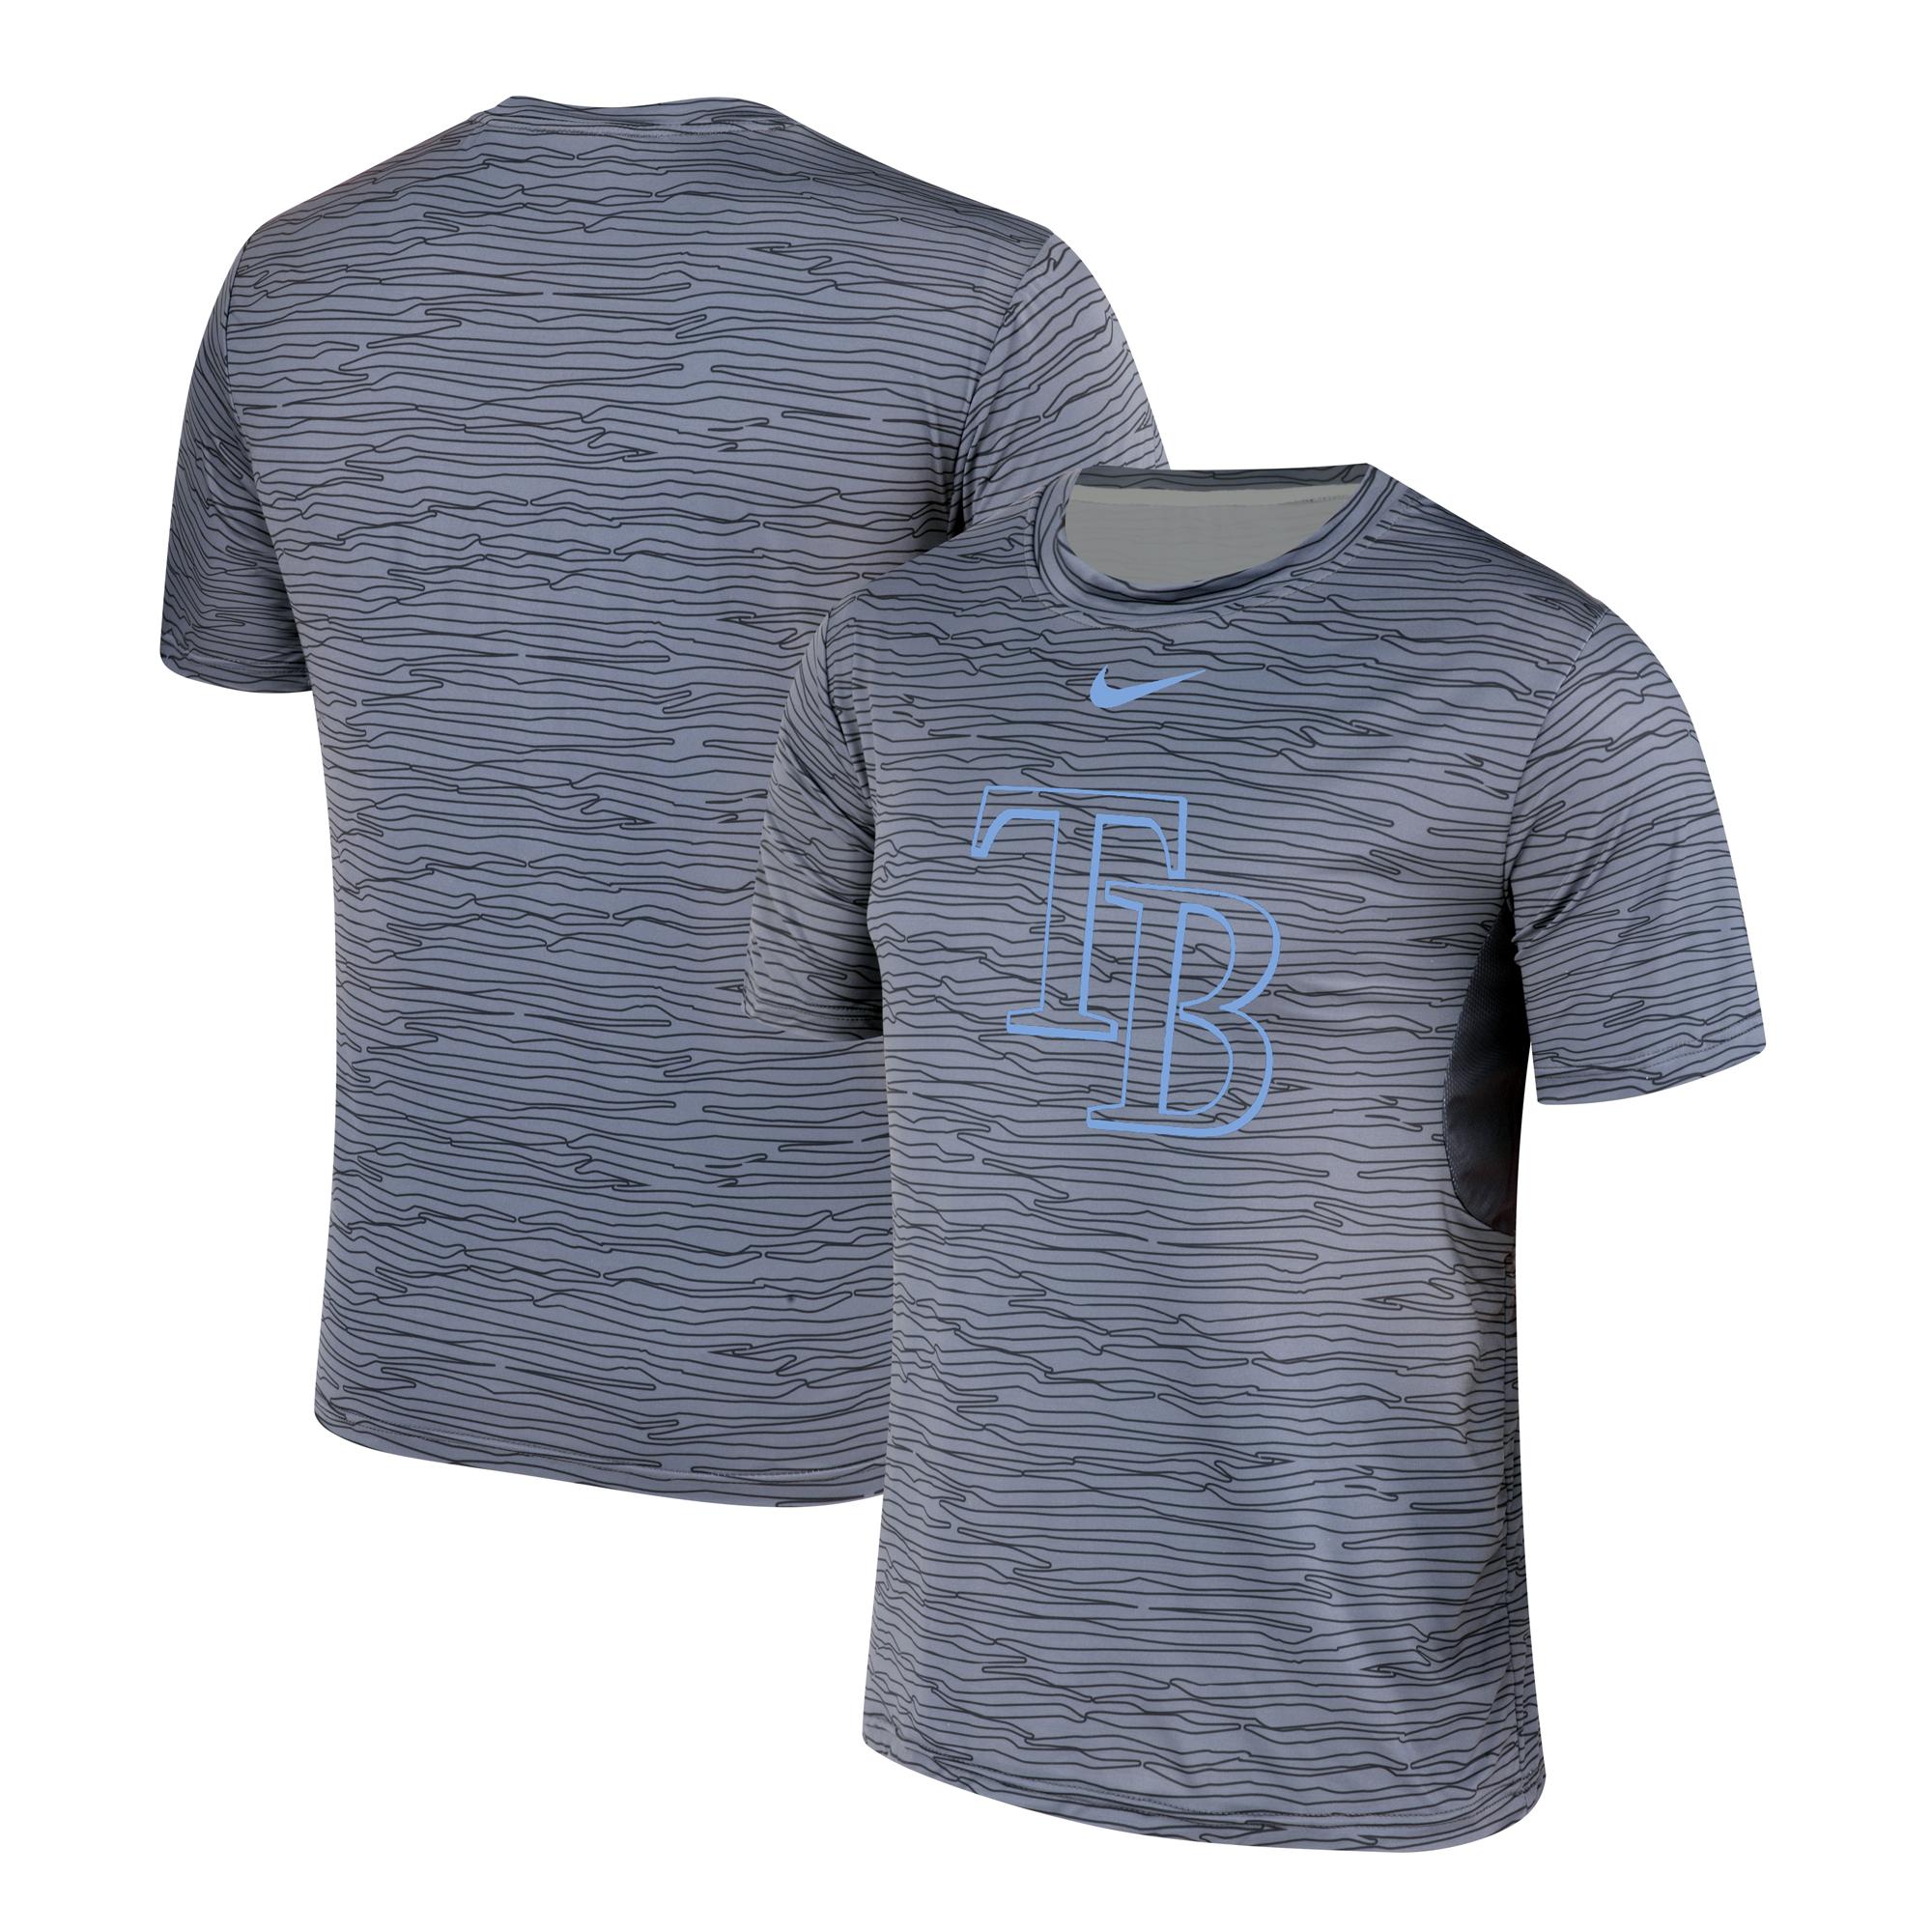 Nike Tampa Bay Rays Gray Black Striped Logo Performance T-Shirt